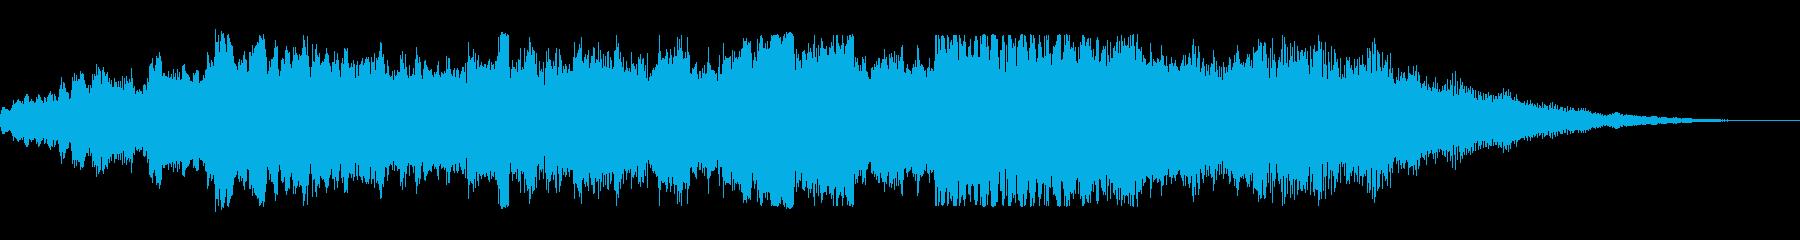 KANT和風オーケストラBGMの再生済みの波形